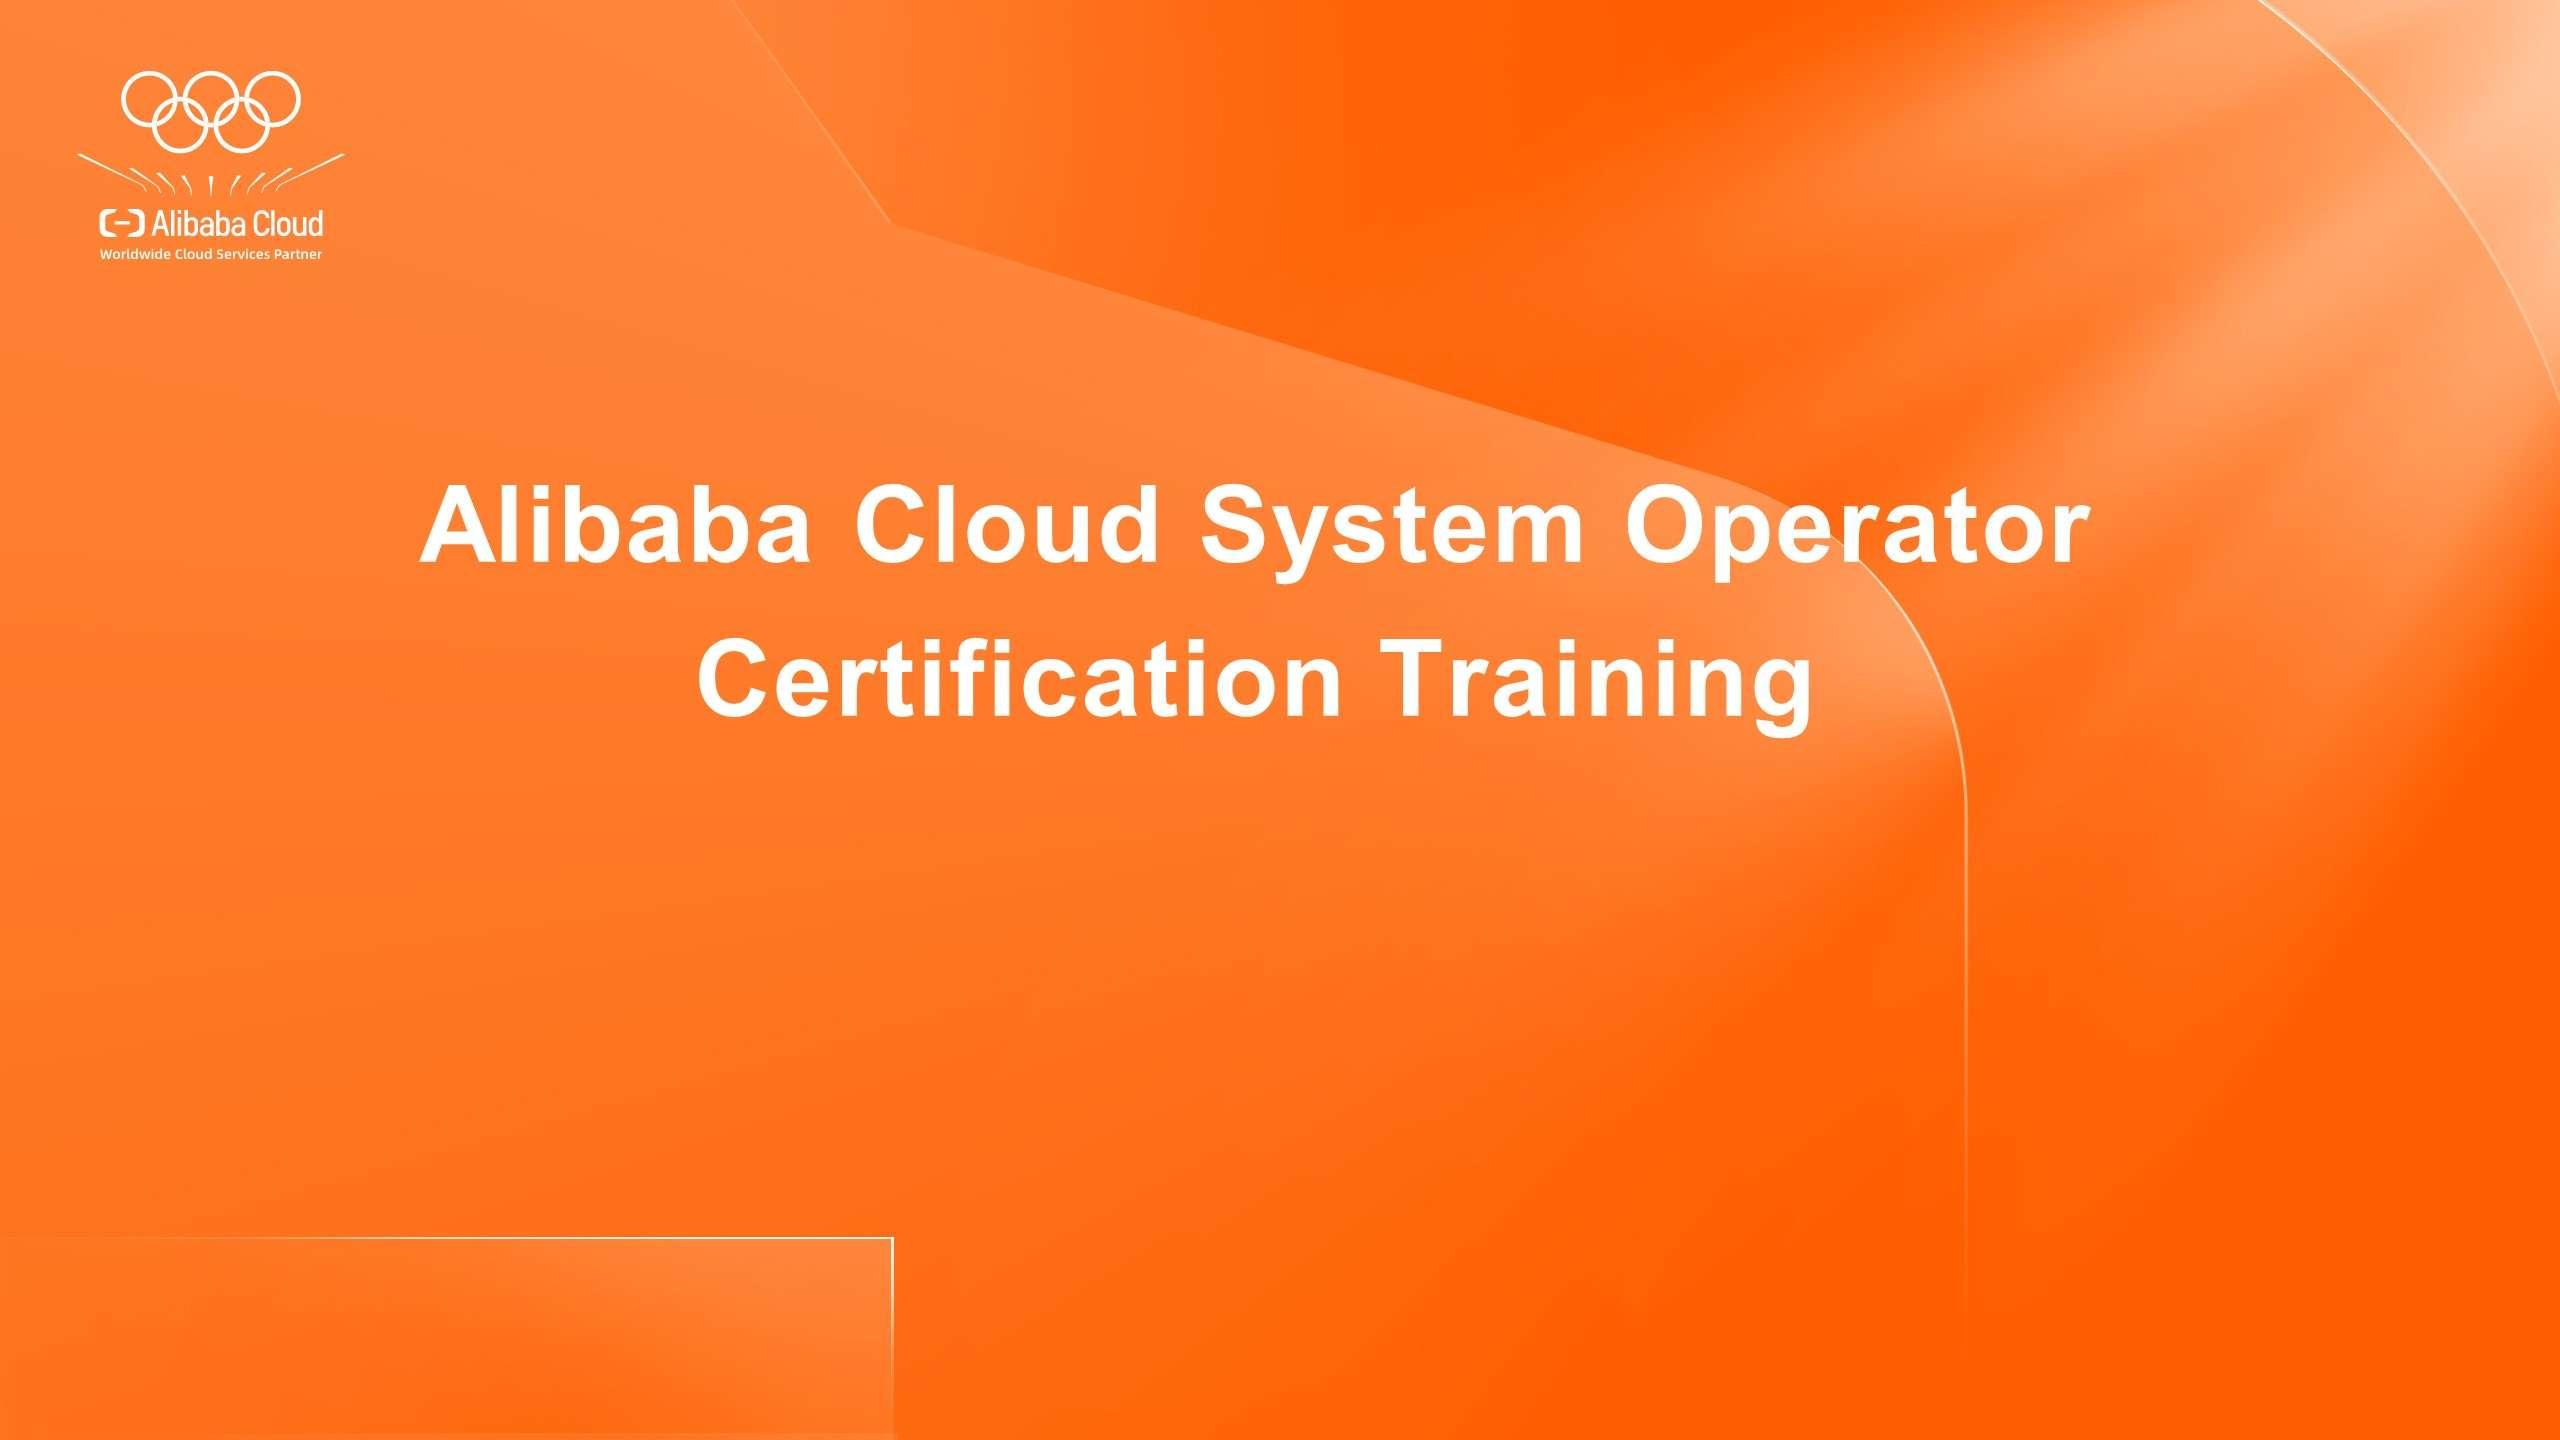 Alibaba Cloud System Operator Certification Training